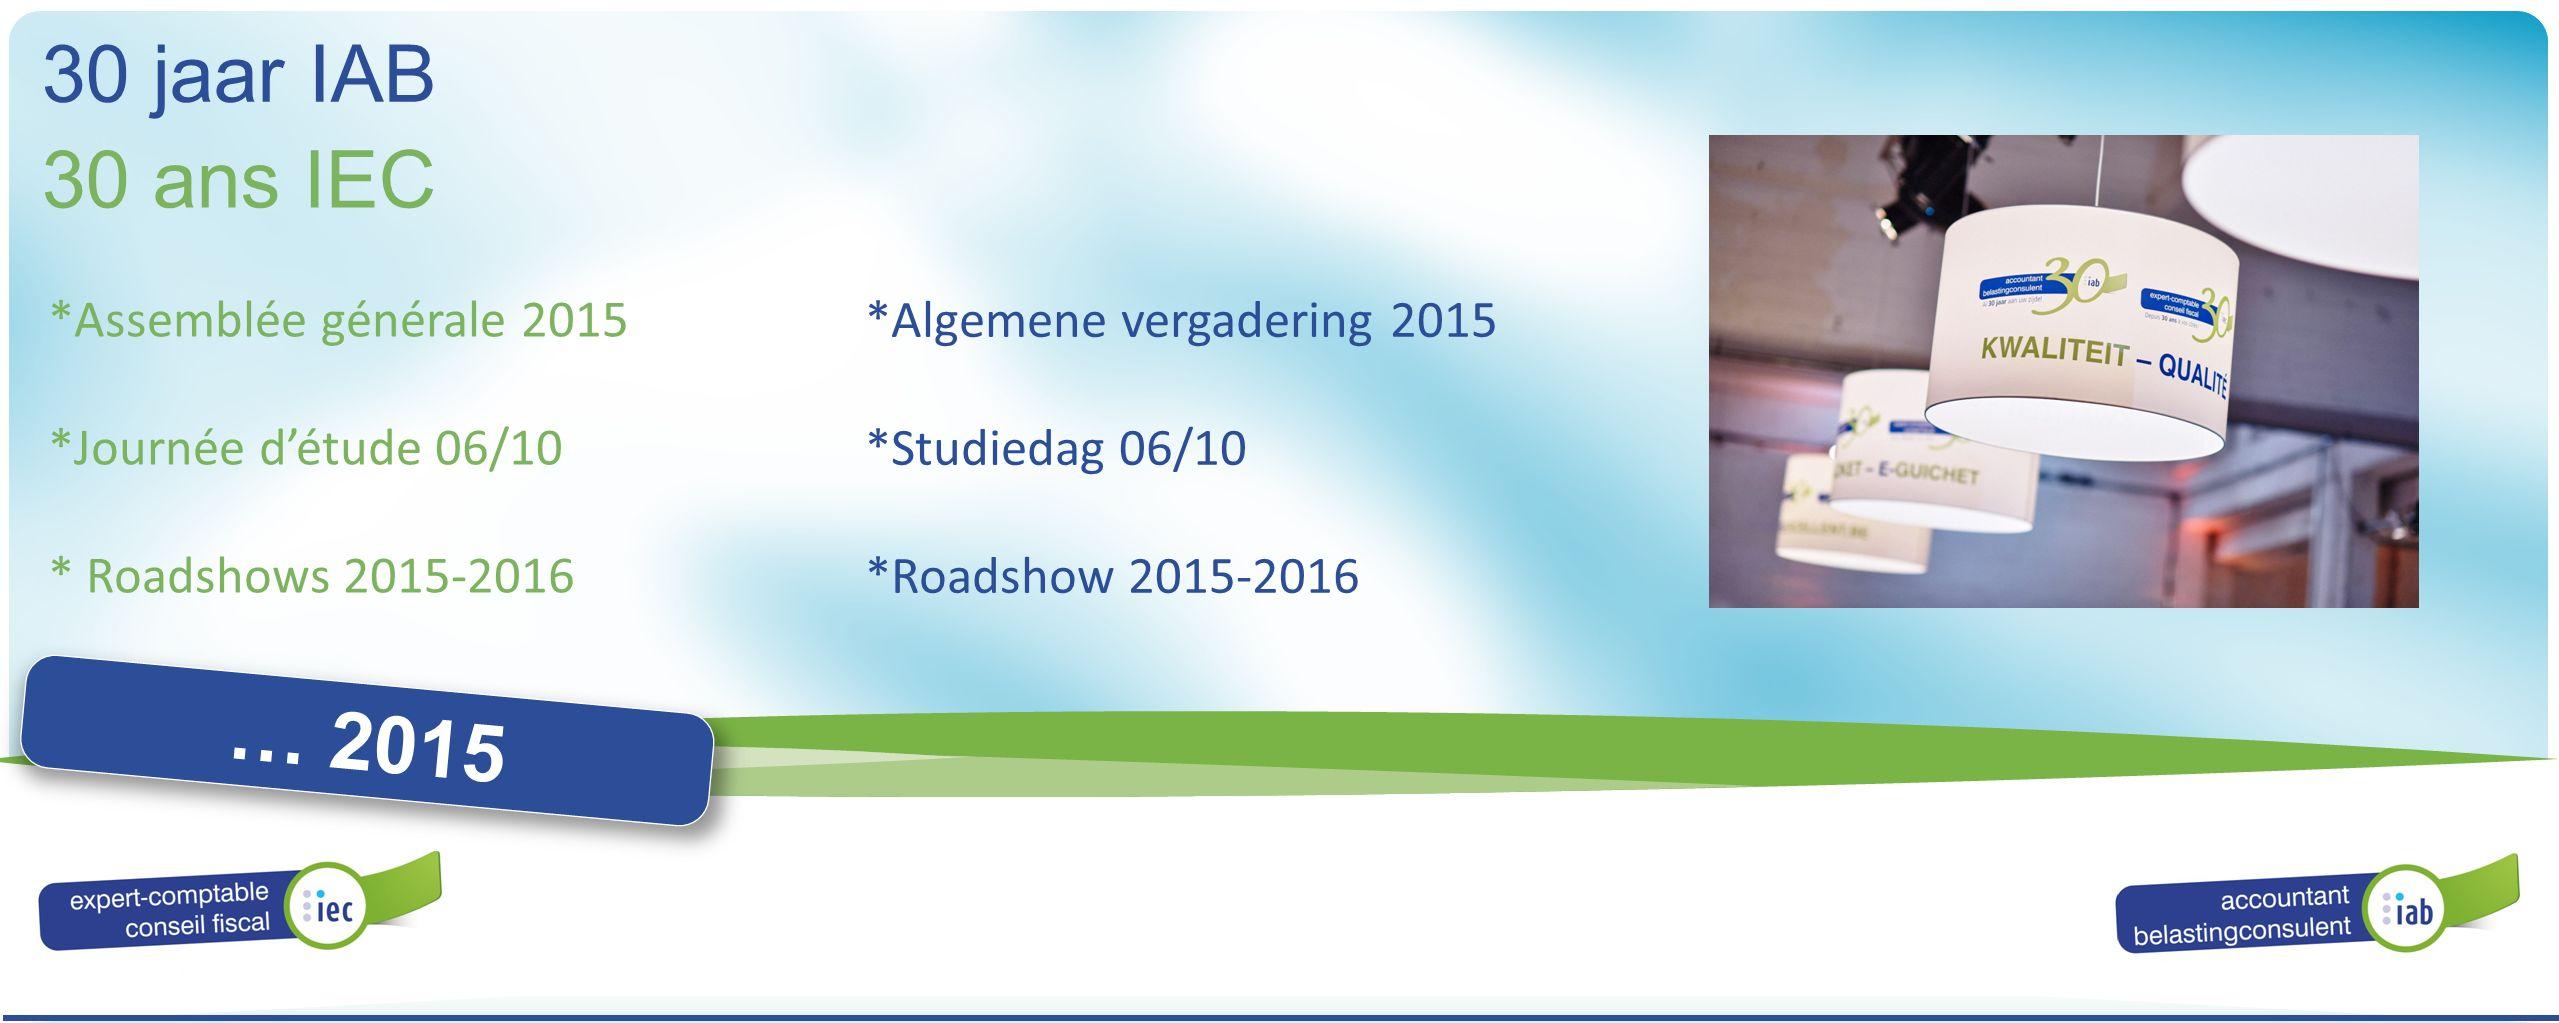 ALGEMENE VERGADERING ASSEMBLÉE GÉNÉRALE 2016 30 ans IEC 30 jaar IAB … 2015 *Assemblée générale 2015 *Journée d'étude 06/10 * Roadshows 2015-2016 *Algemene vergadering 2015 *Studiedag 06/10 *Roadshow 2015-2016